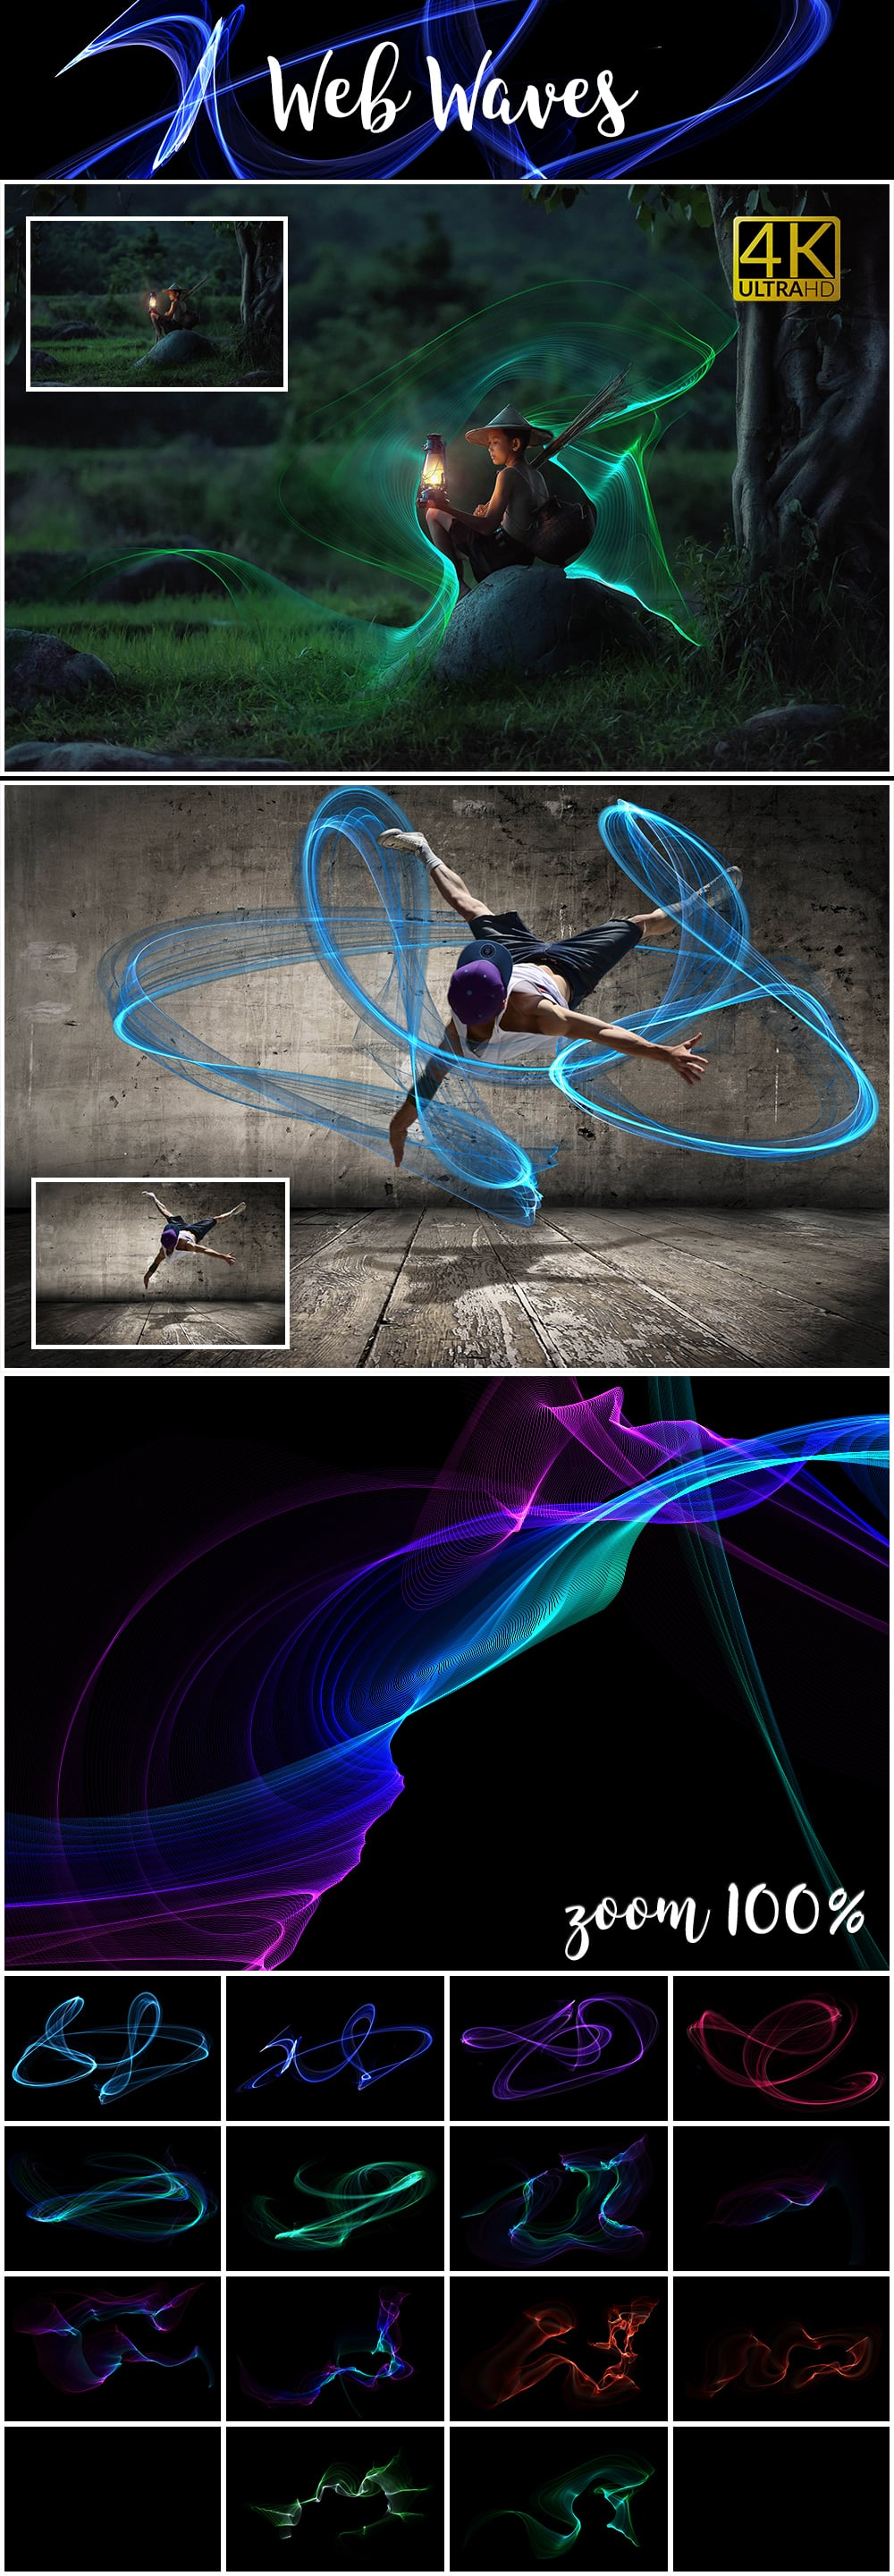 1100 Photoshop Overlays Mega Pack - Extended License - 15 Web Waves